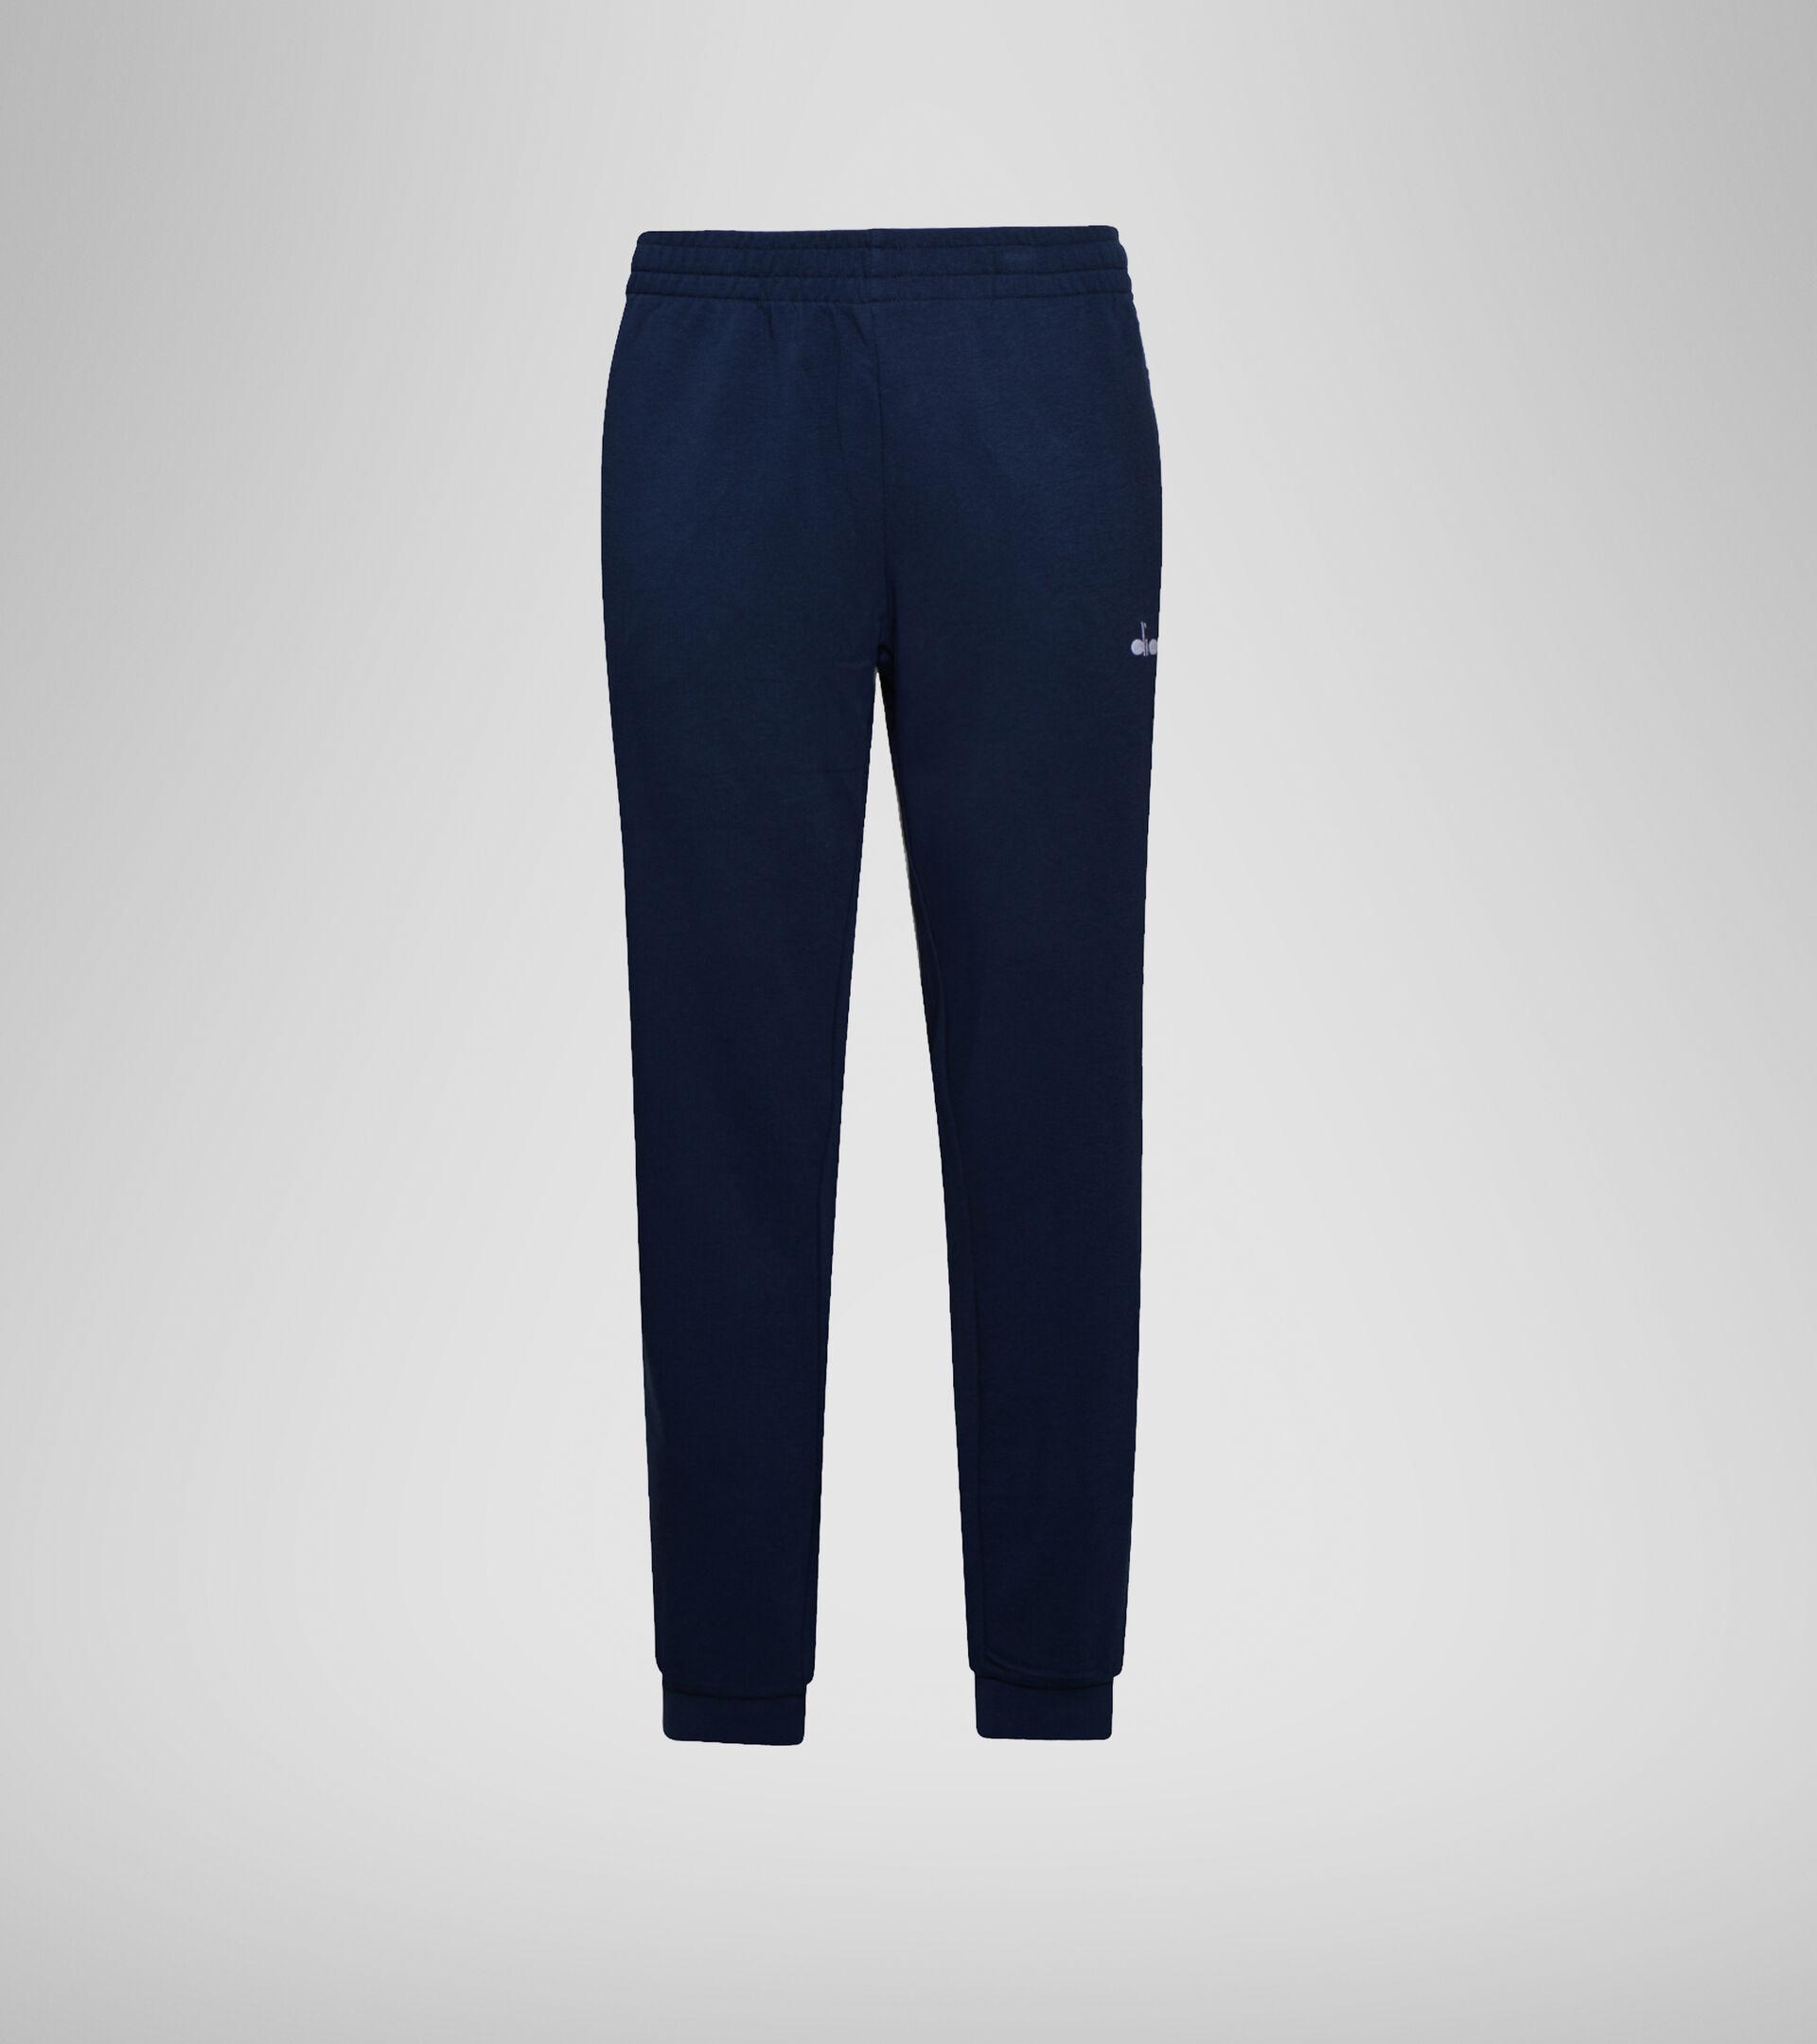 Pantaloni sportivi - Uomo PANT CUFF CORE BLU CORSARO - Diadora